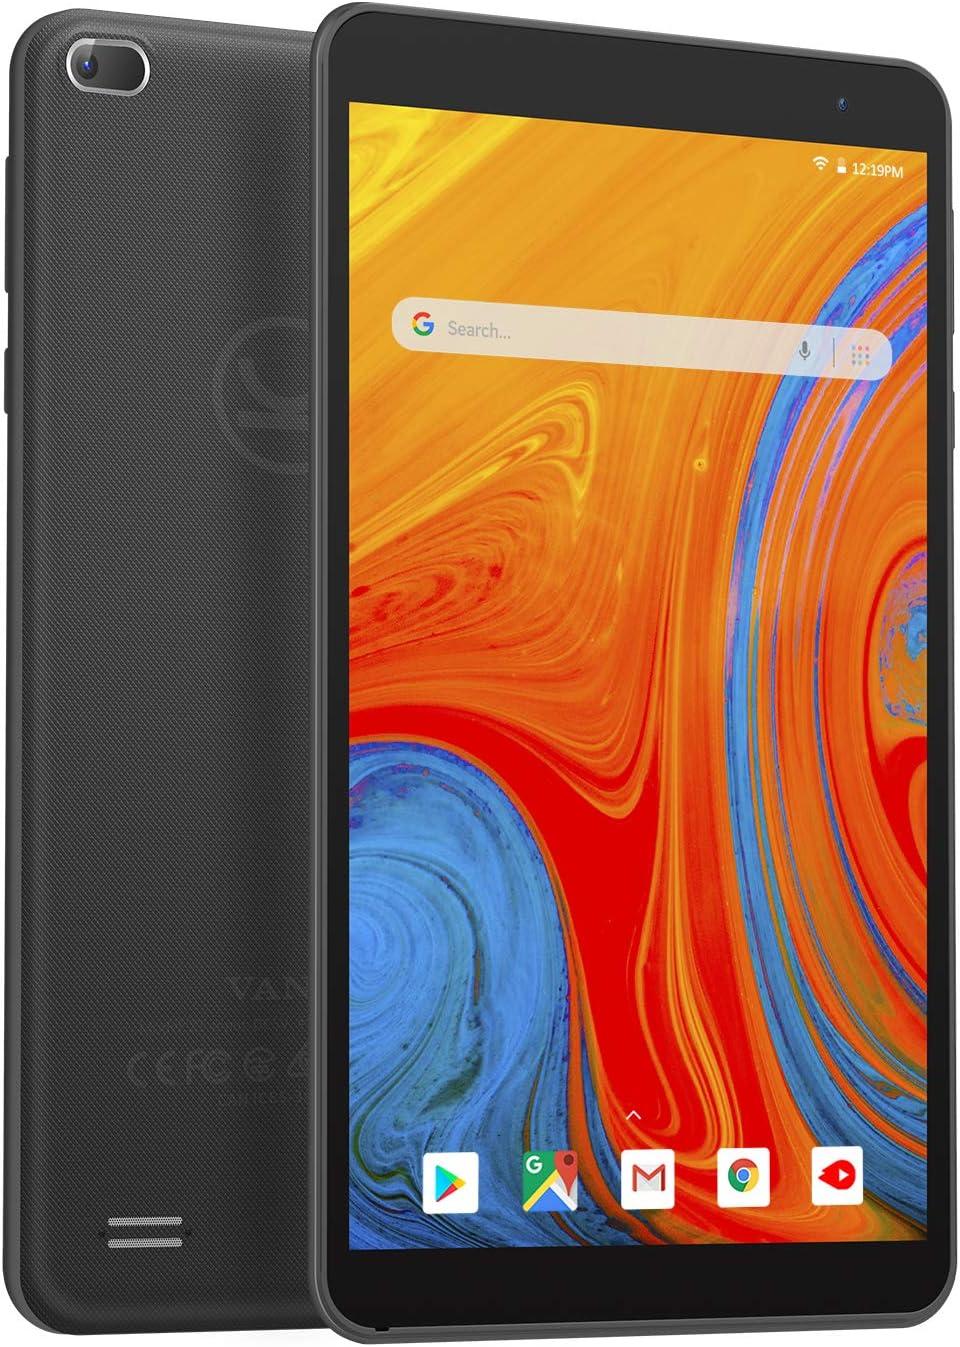 VANKYO MatrixPad Z1 Upgrade 7 inch Tablet, Android 10, 32GB Storage, Quad-Core Processor, IPS HD Display, Wi-Fi, Bluetooth, Black